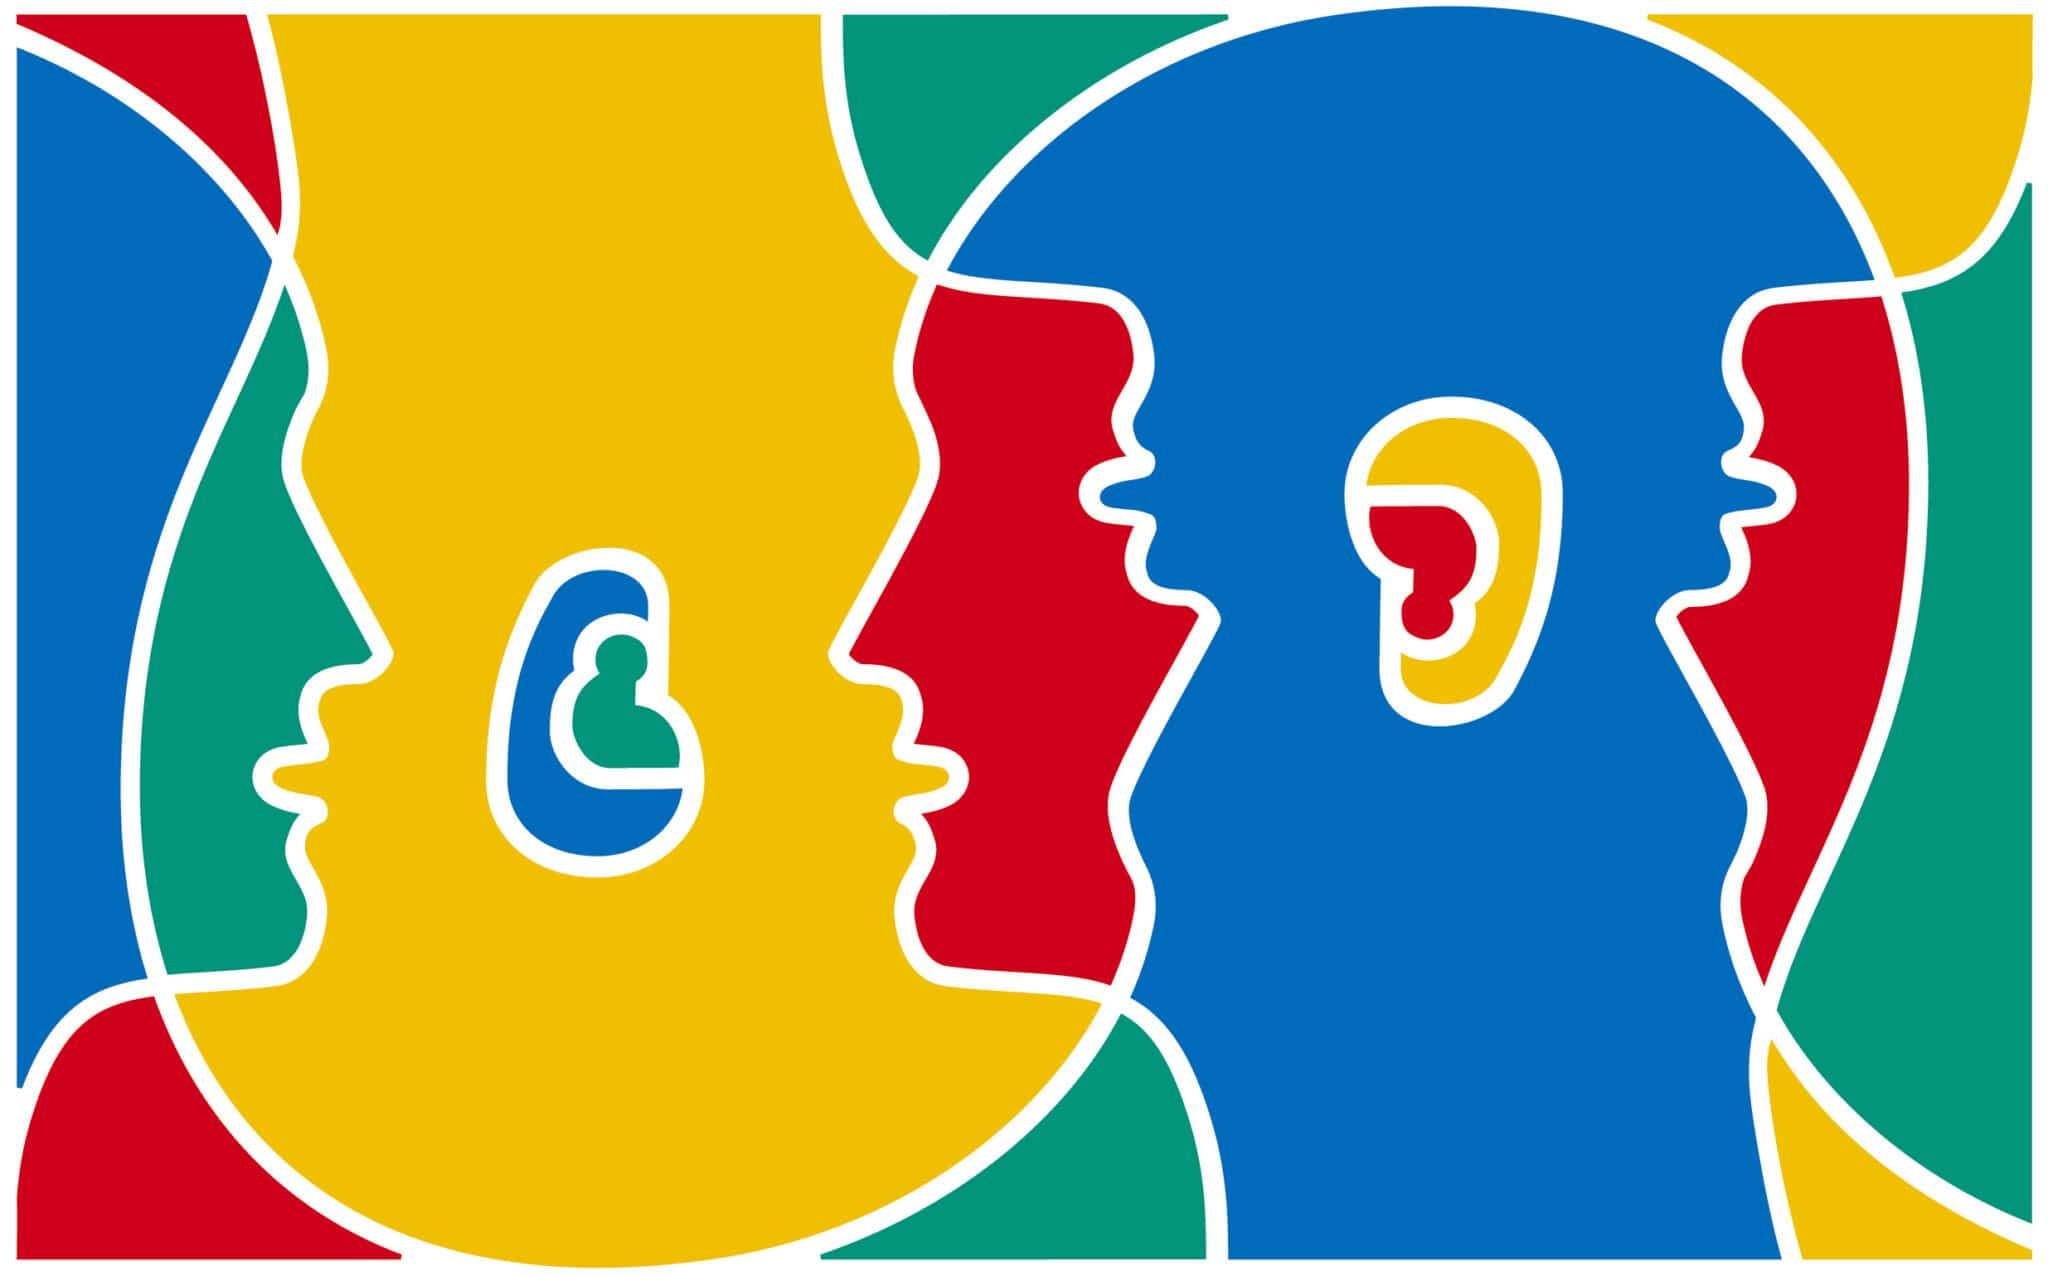 nyelvek-europai-napja-converzum